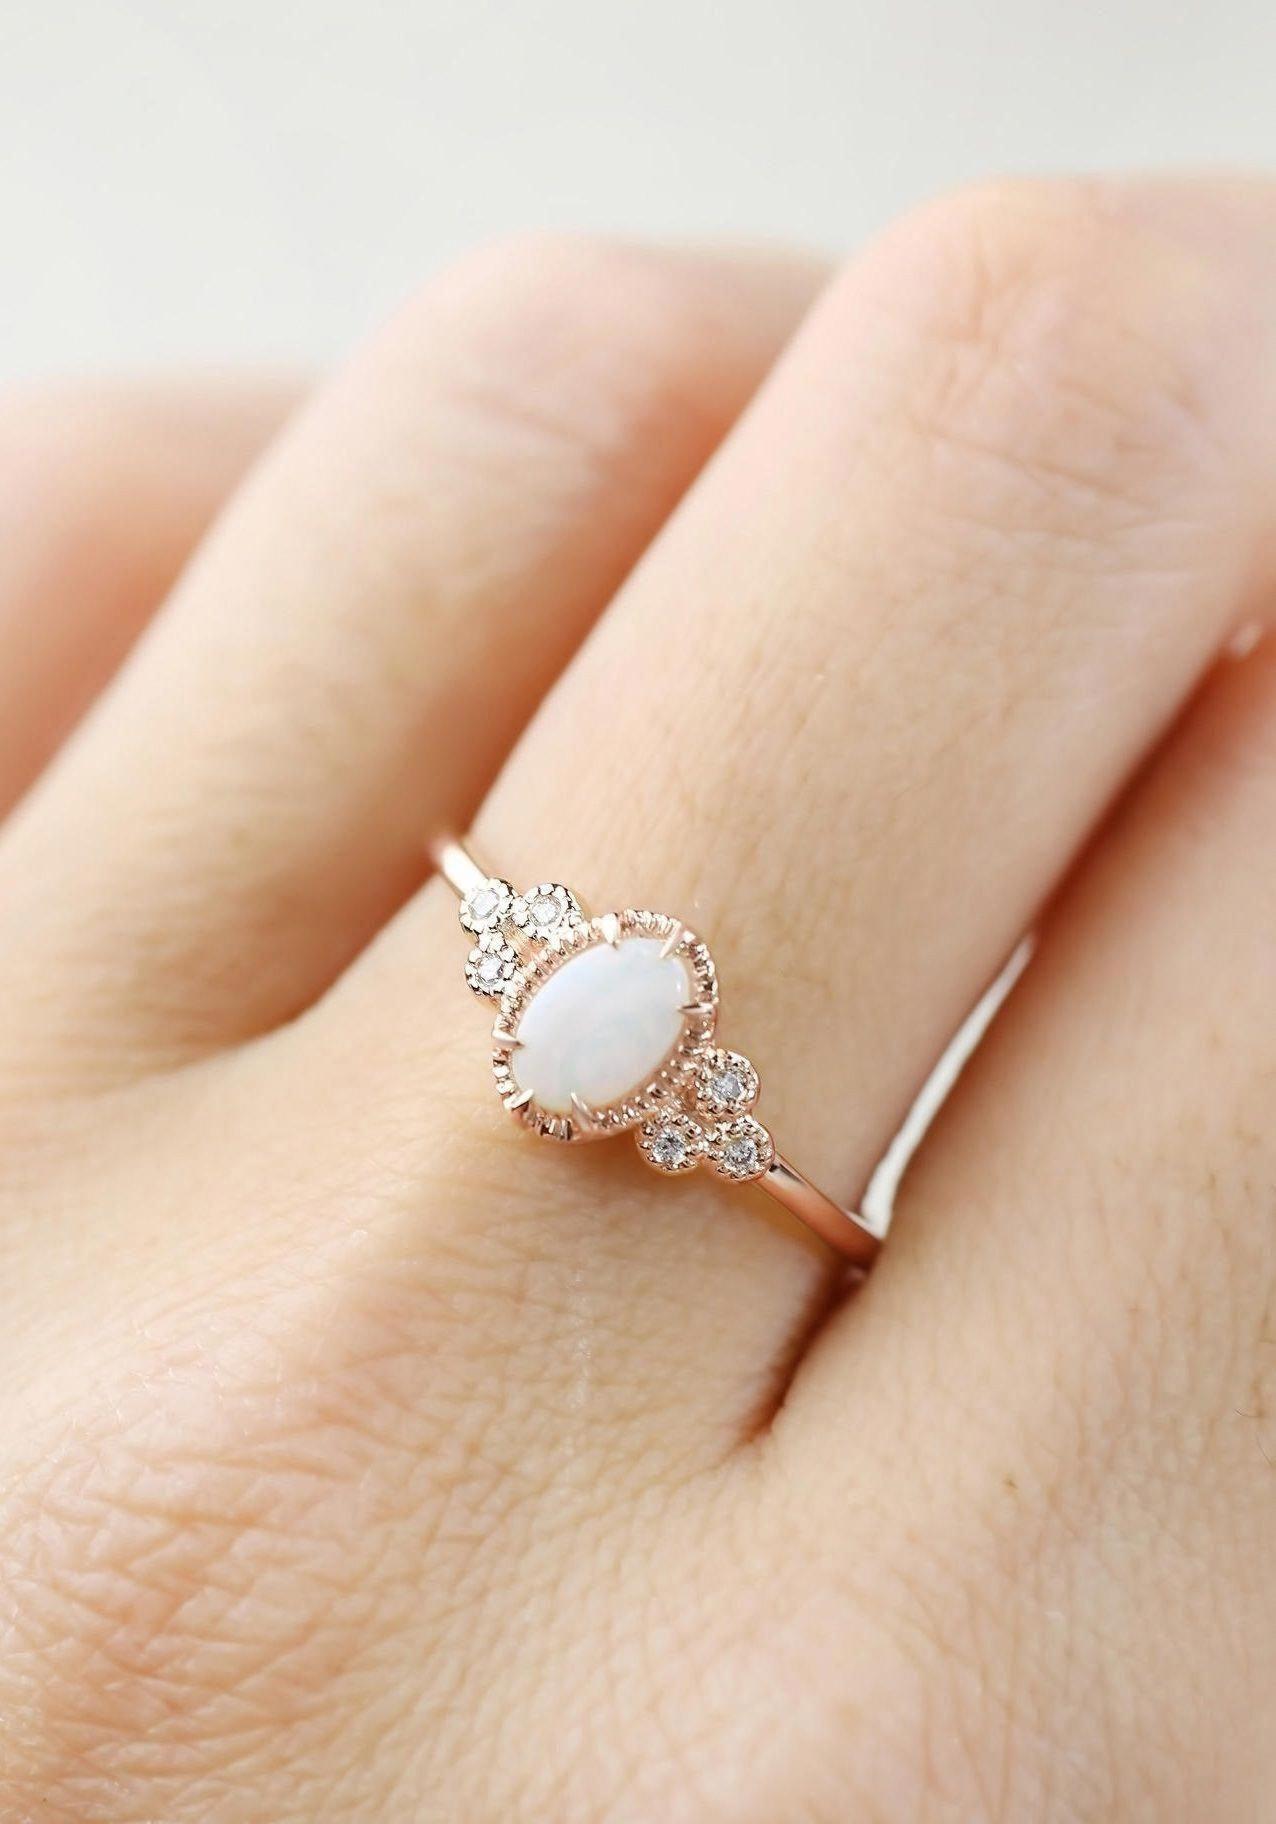 Affordable Engagement Rings 2988 Affordableengagementrings Engagement Rings Opal Rose Engagement Ring Vintage Wedding Rings Vintage